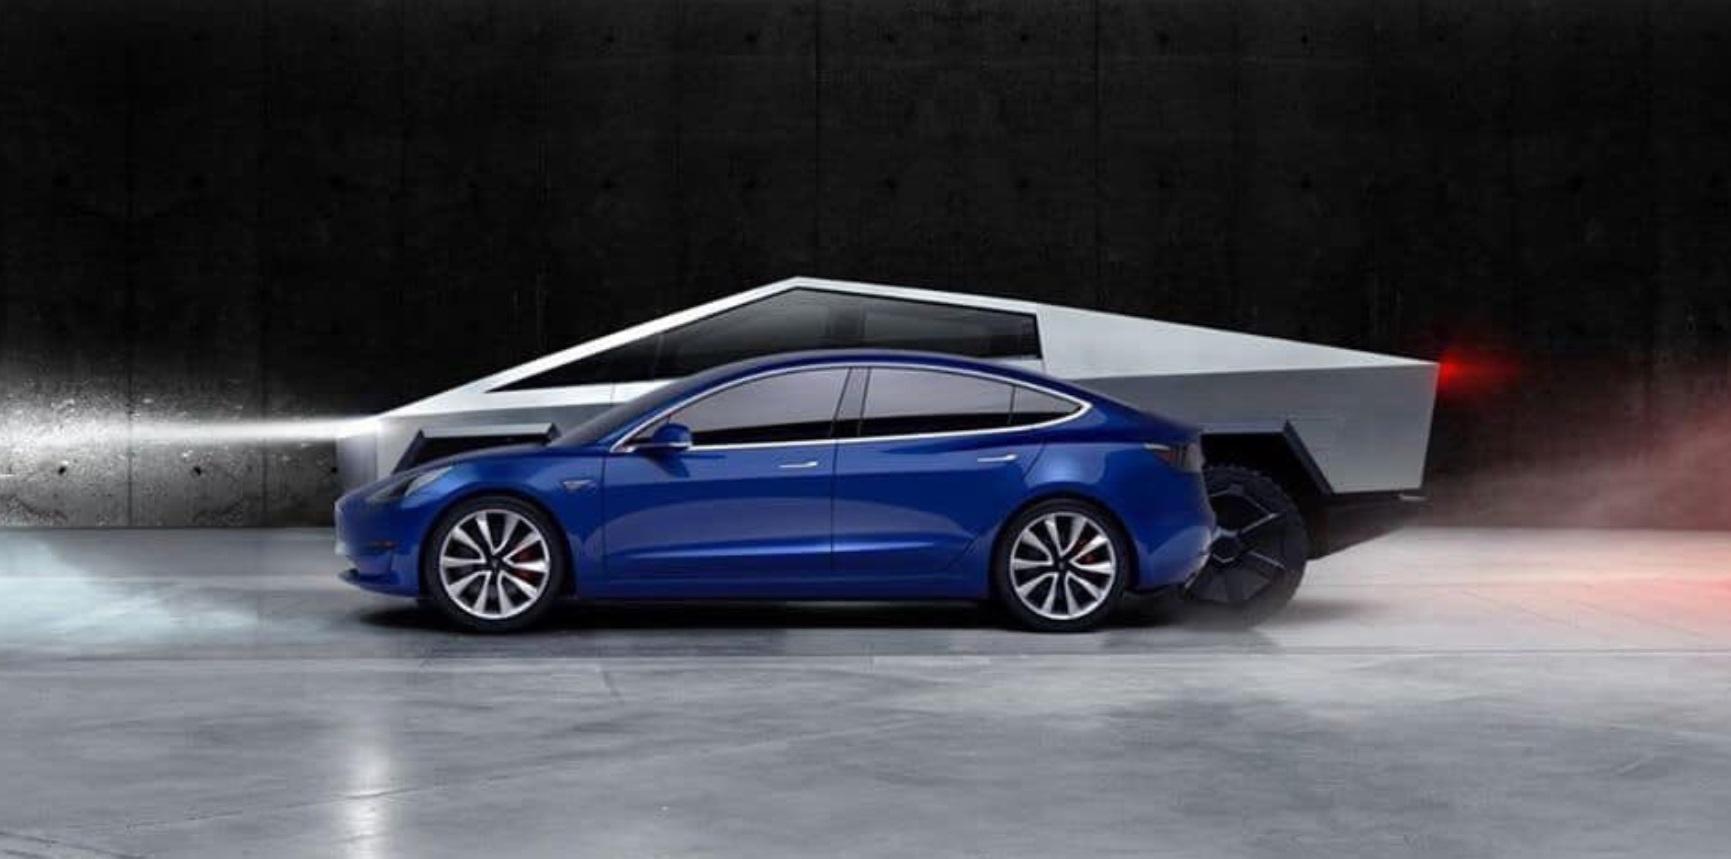 Tesla Cybertruck - Page 3 PHOTOS-Tesla-CyberTruck-Size-comparison-Vs-Model-S-2